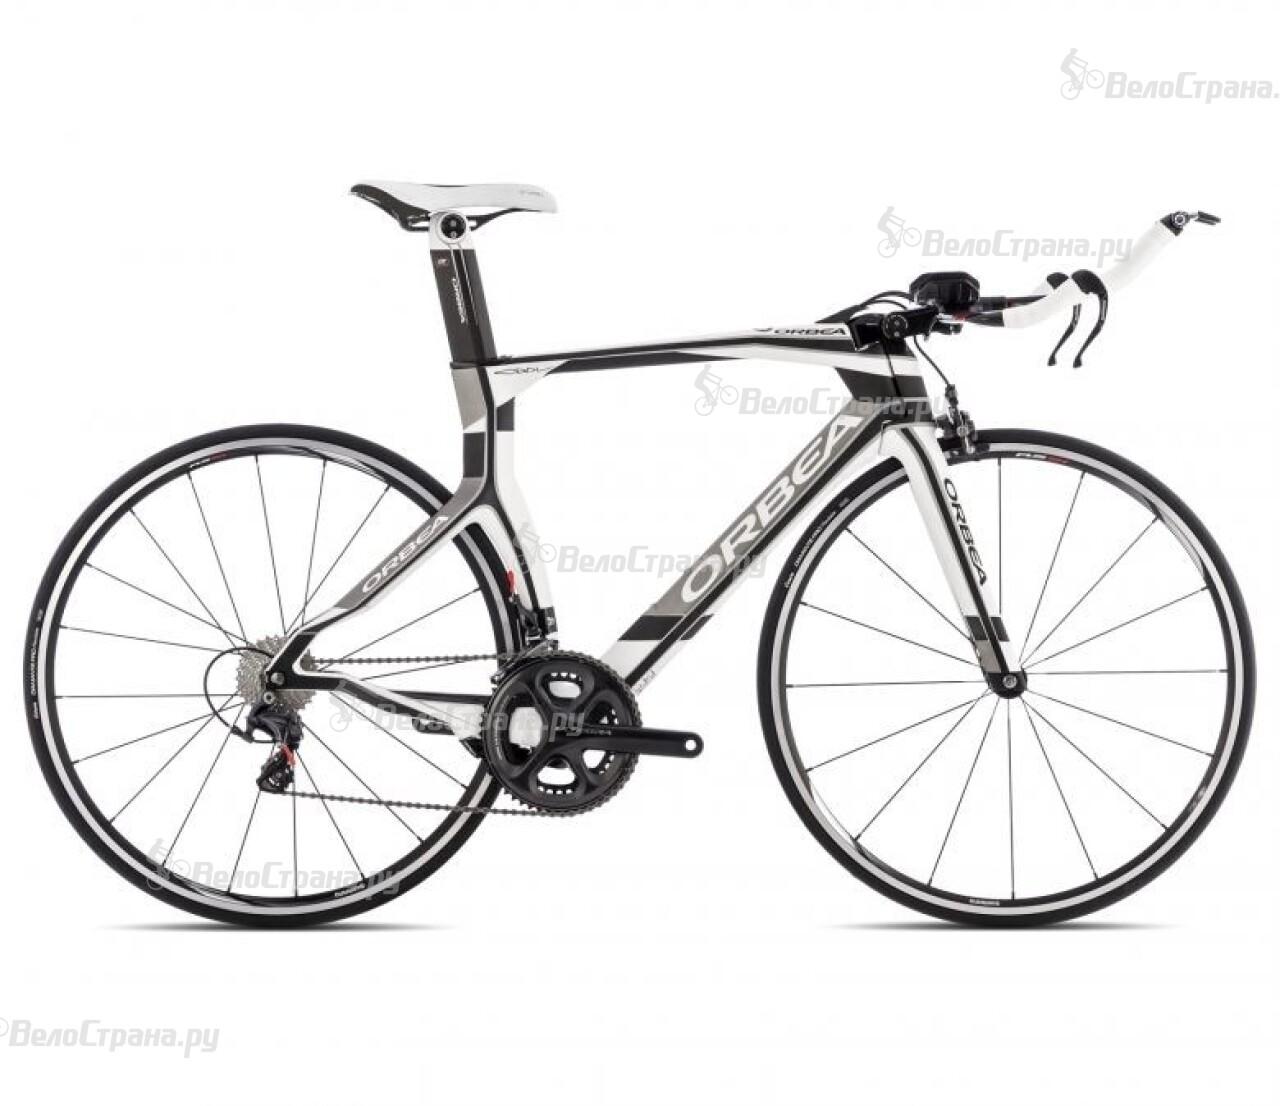 Велосипед Orbea Ordu M30 XS (2014) велосипед orbea ordu m ltd 2014